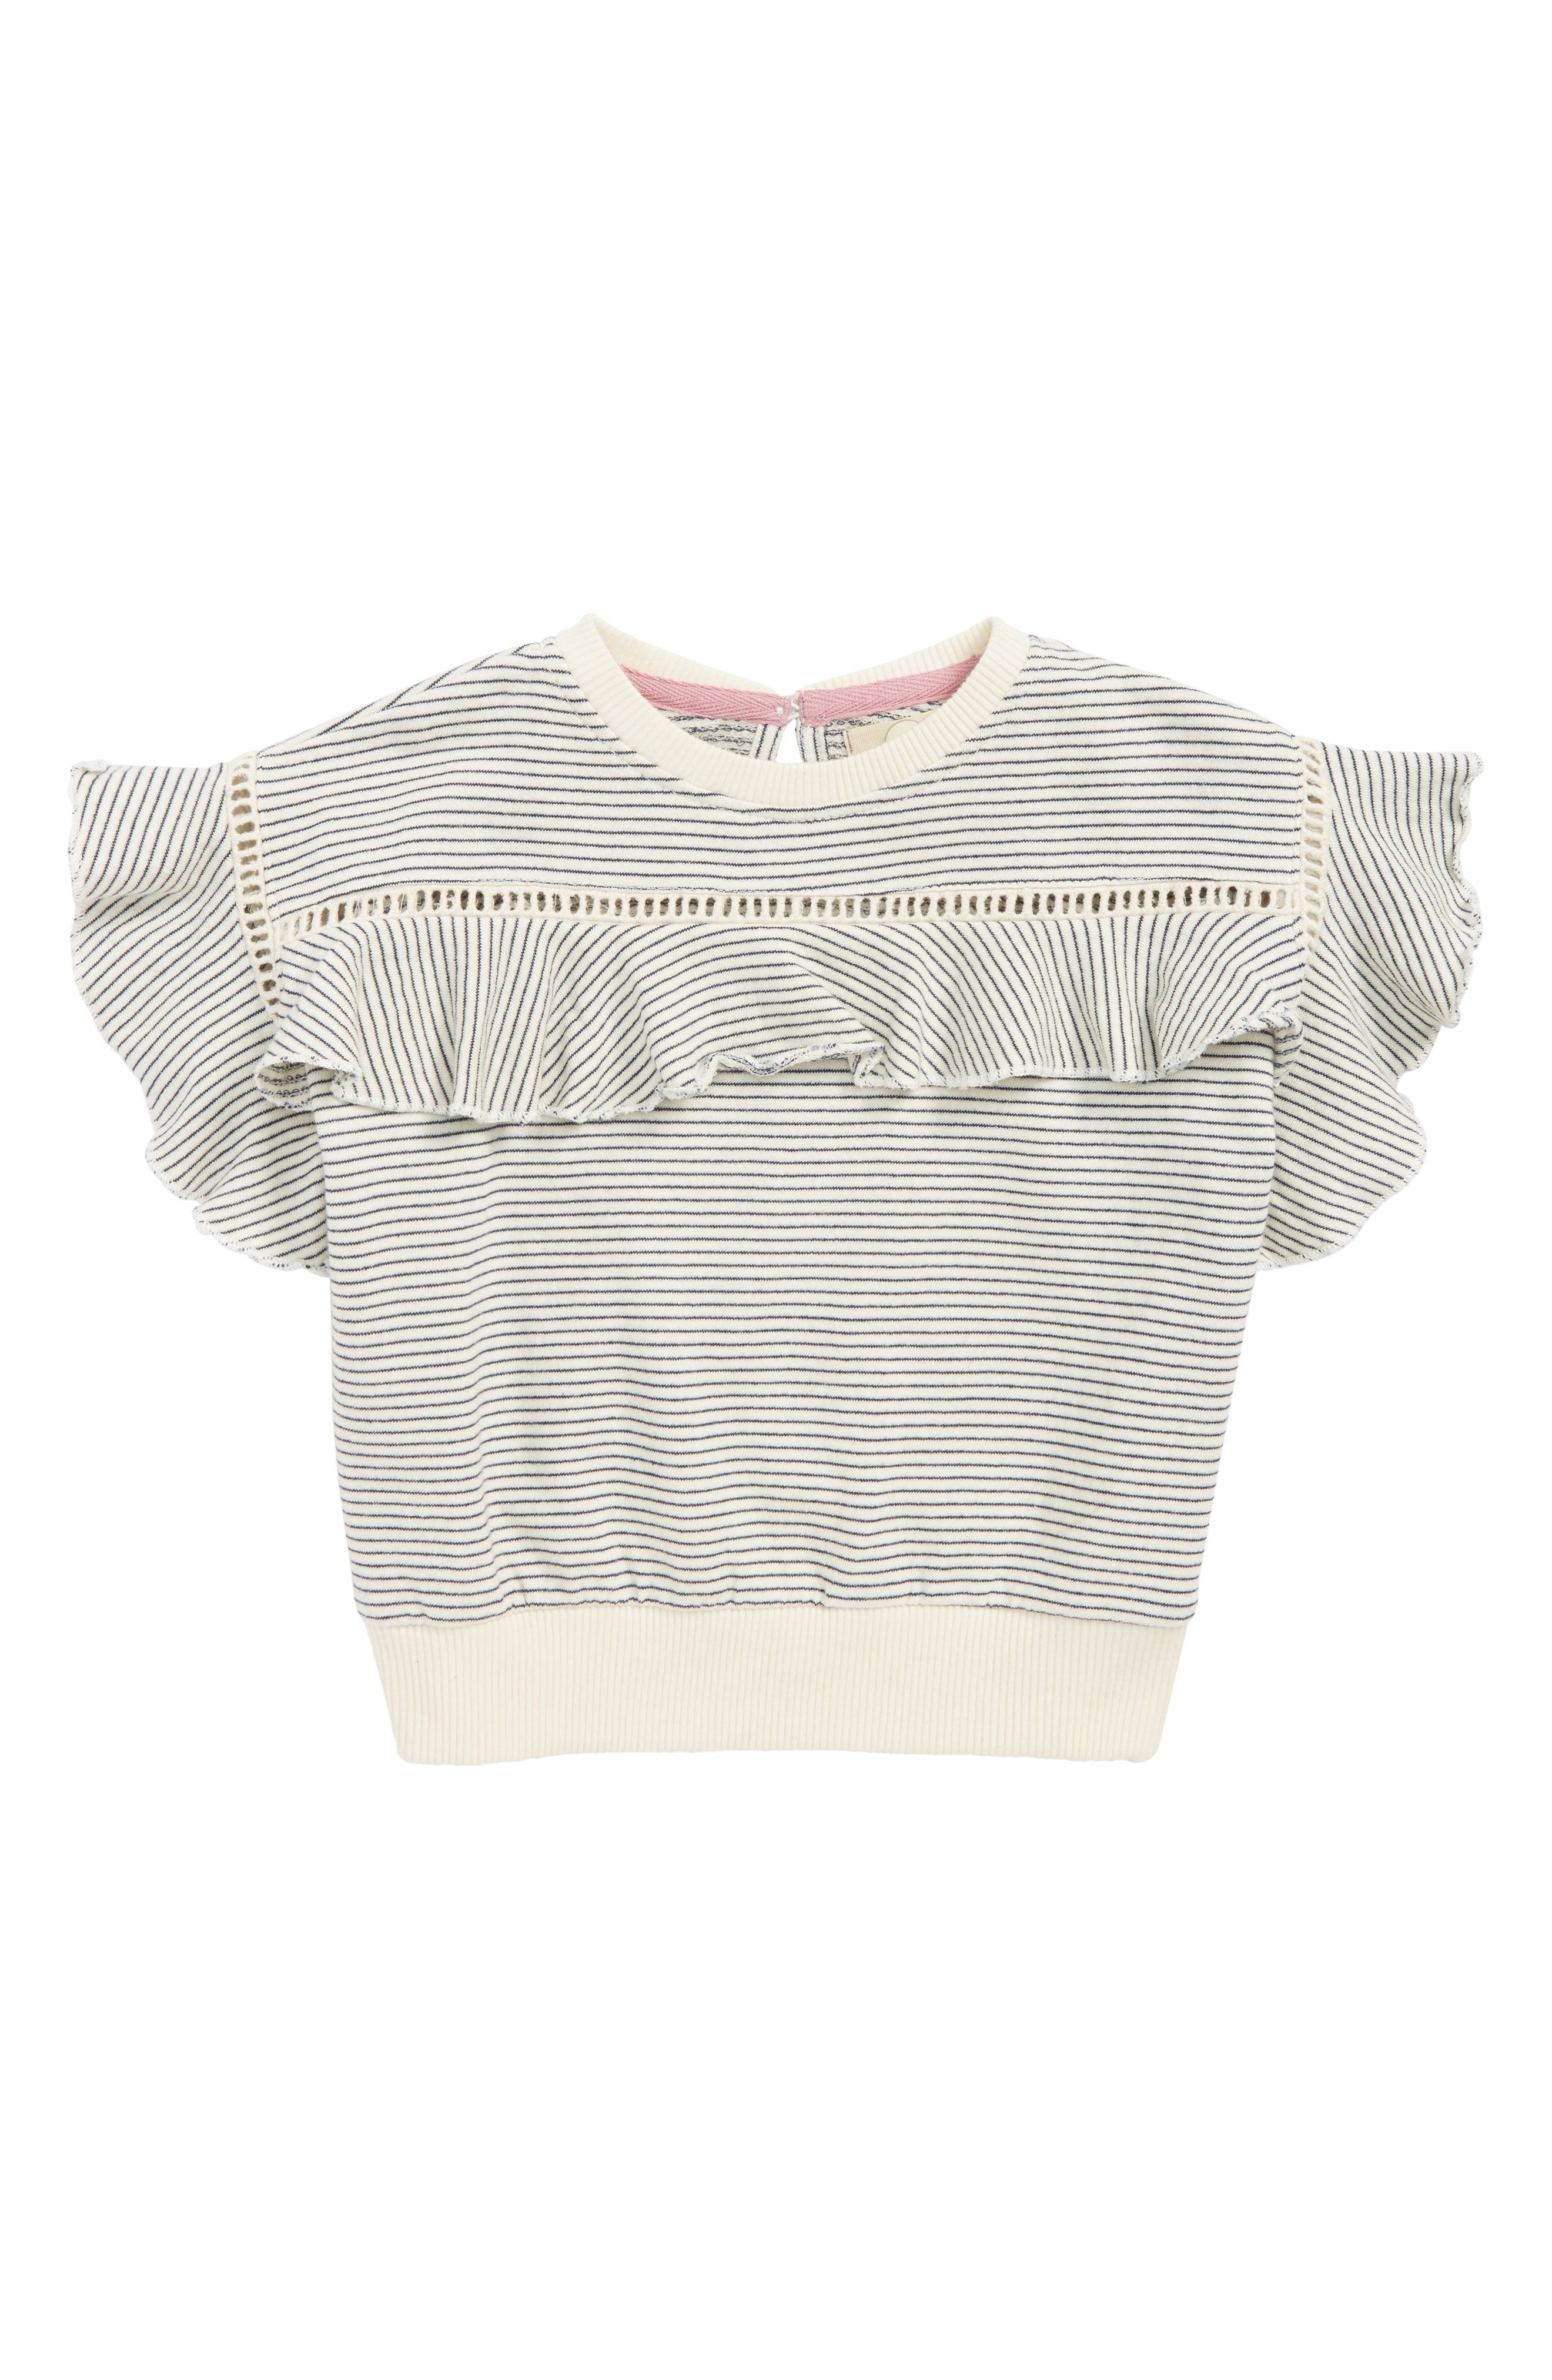 Amelia Ruffle Sweatshirt,                         Main,                         color, 900